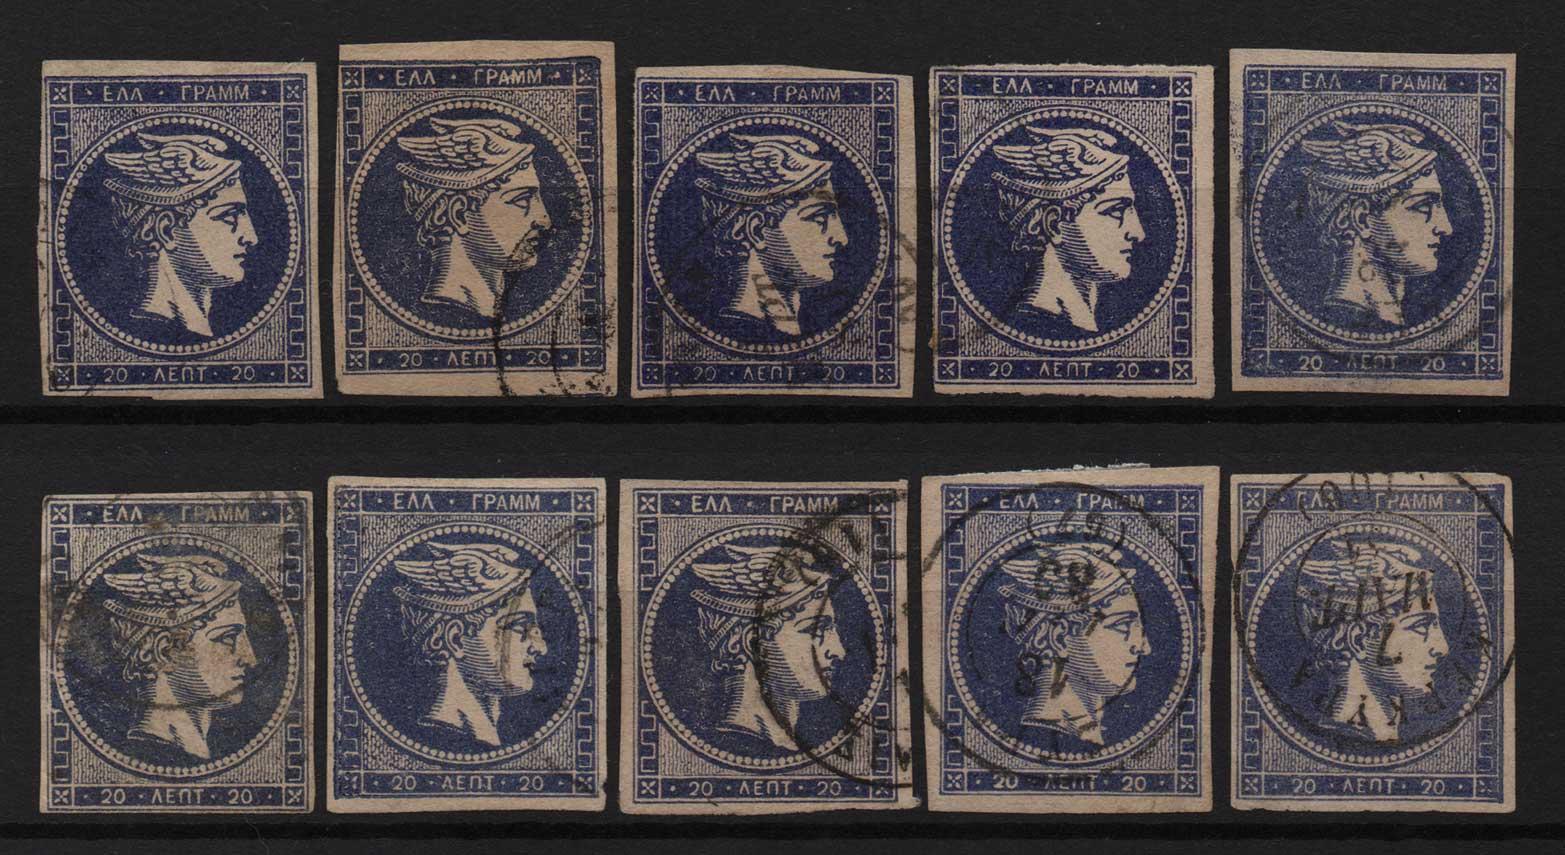 Lot 17 - GREECE-  LARGE HERMES HEAD large hermes head -  Athens Auctions Public Auction 63 General Stamp Sale